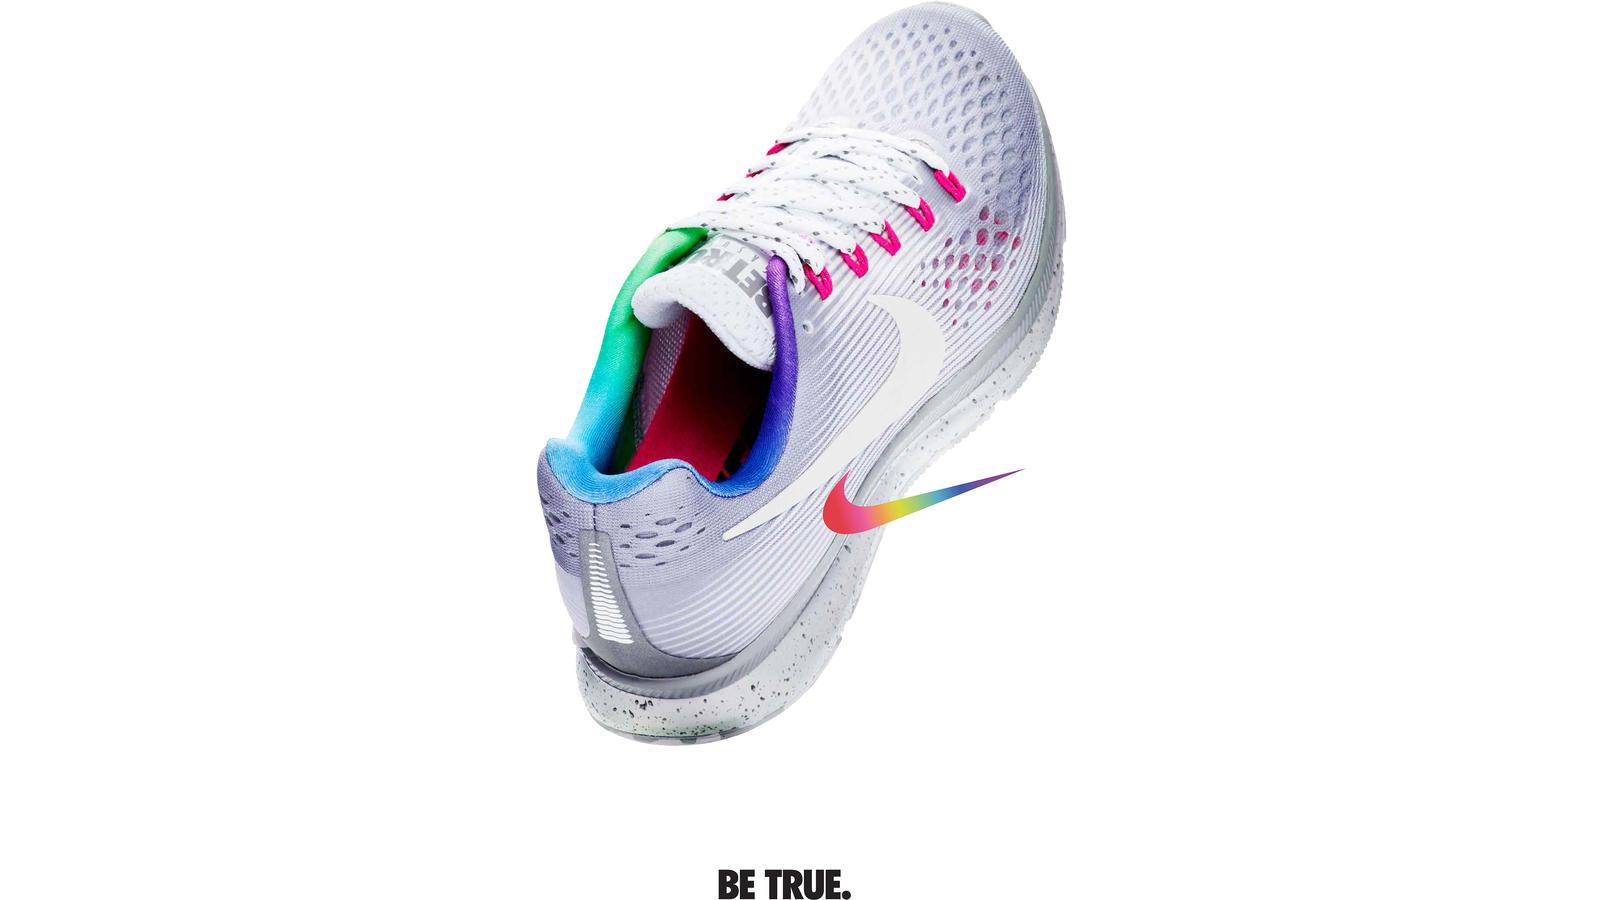 3675b3d70940 Nike Flyknit Racer BETRUE. BETRUE 2017 29